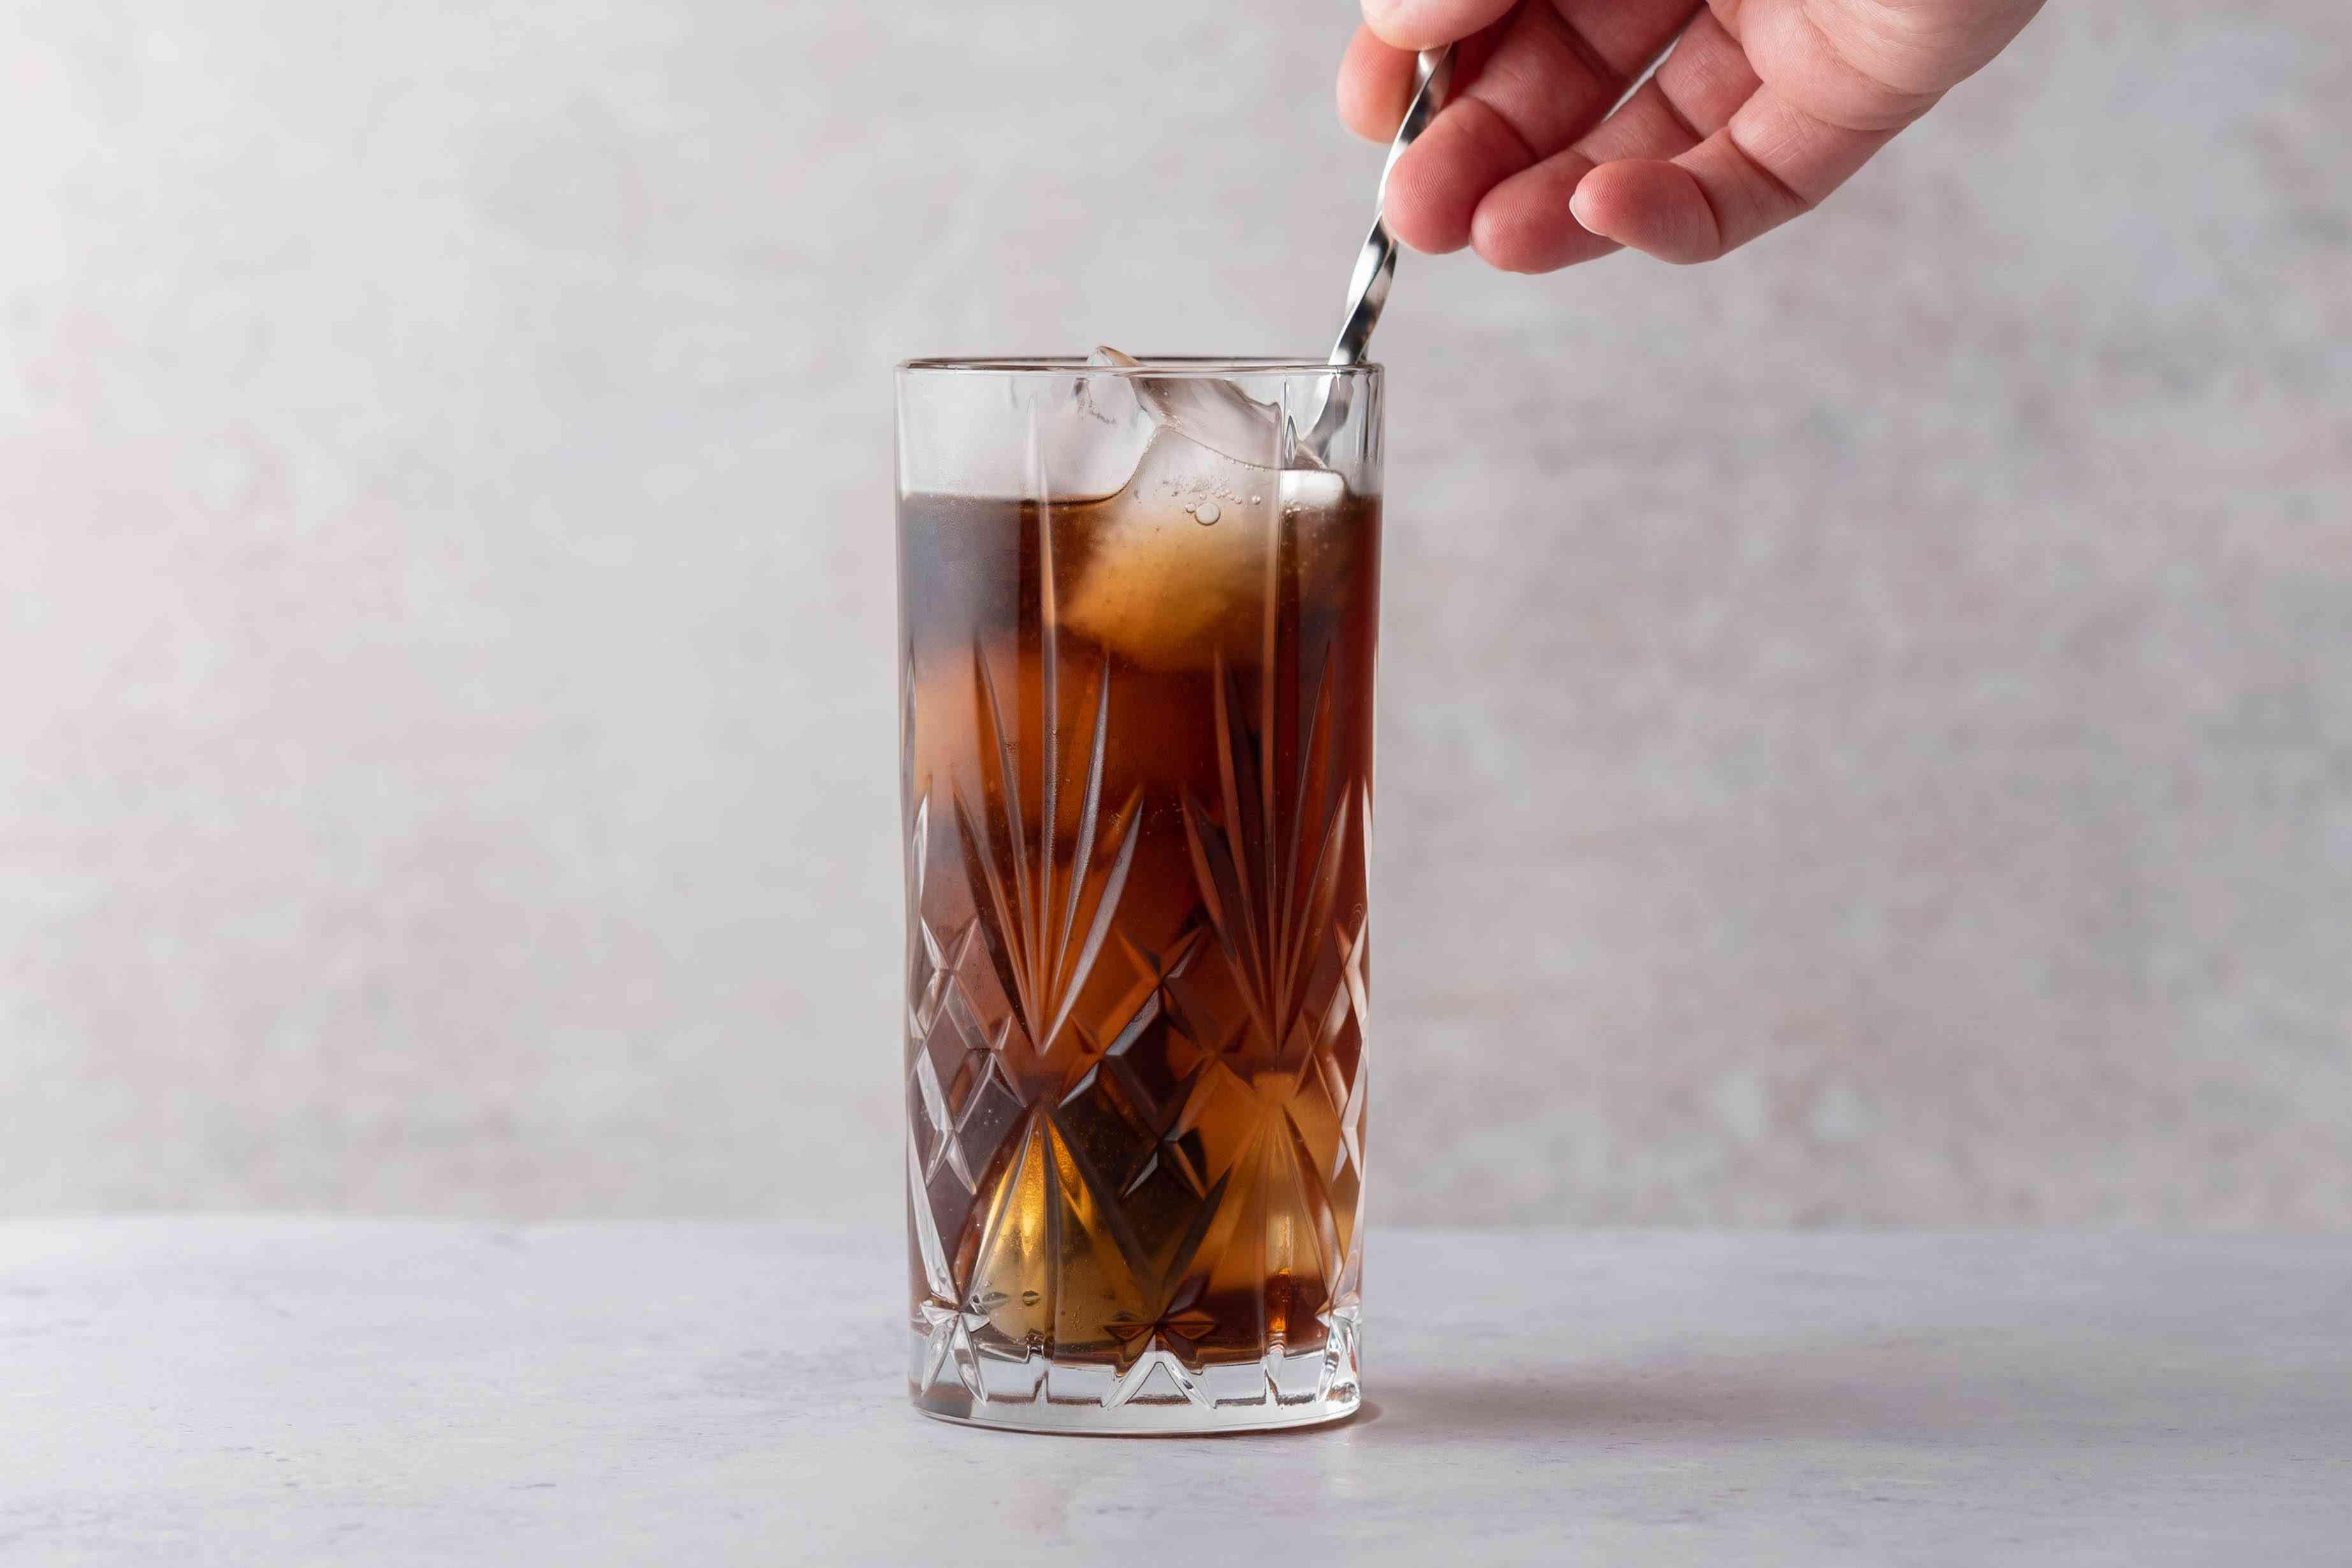 stir the cocktail